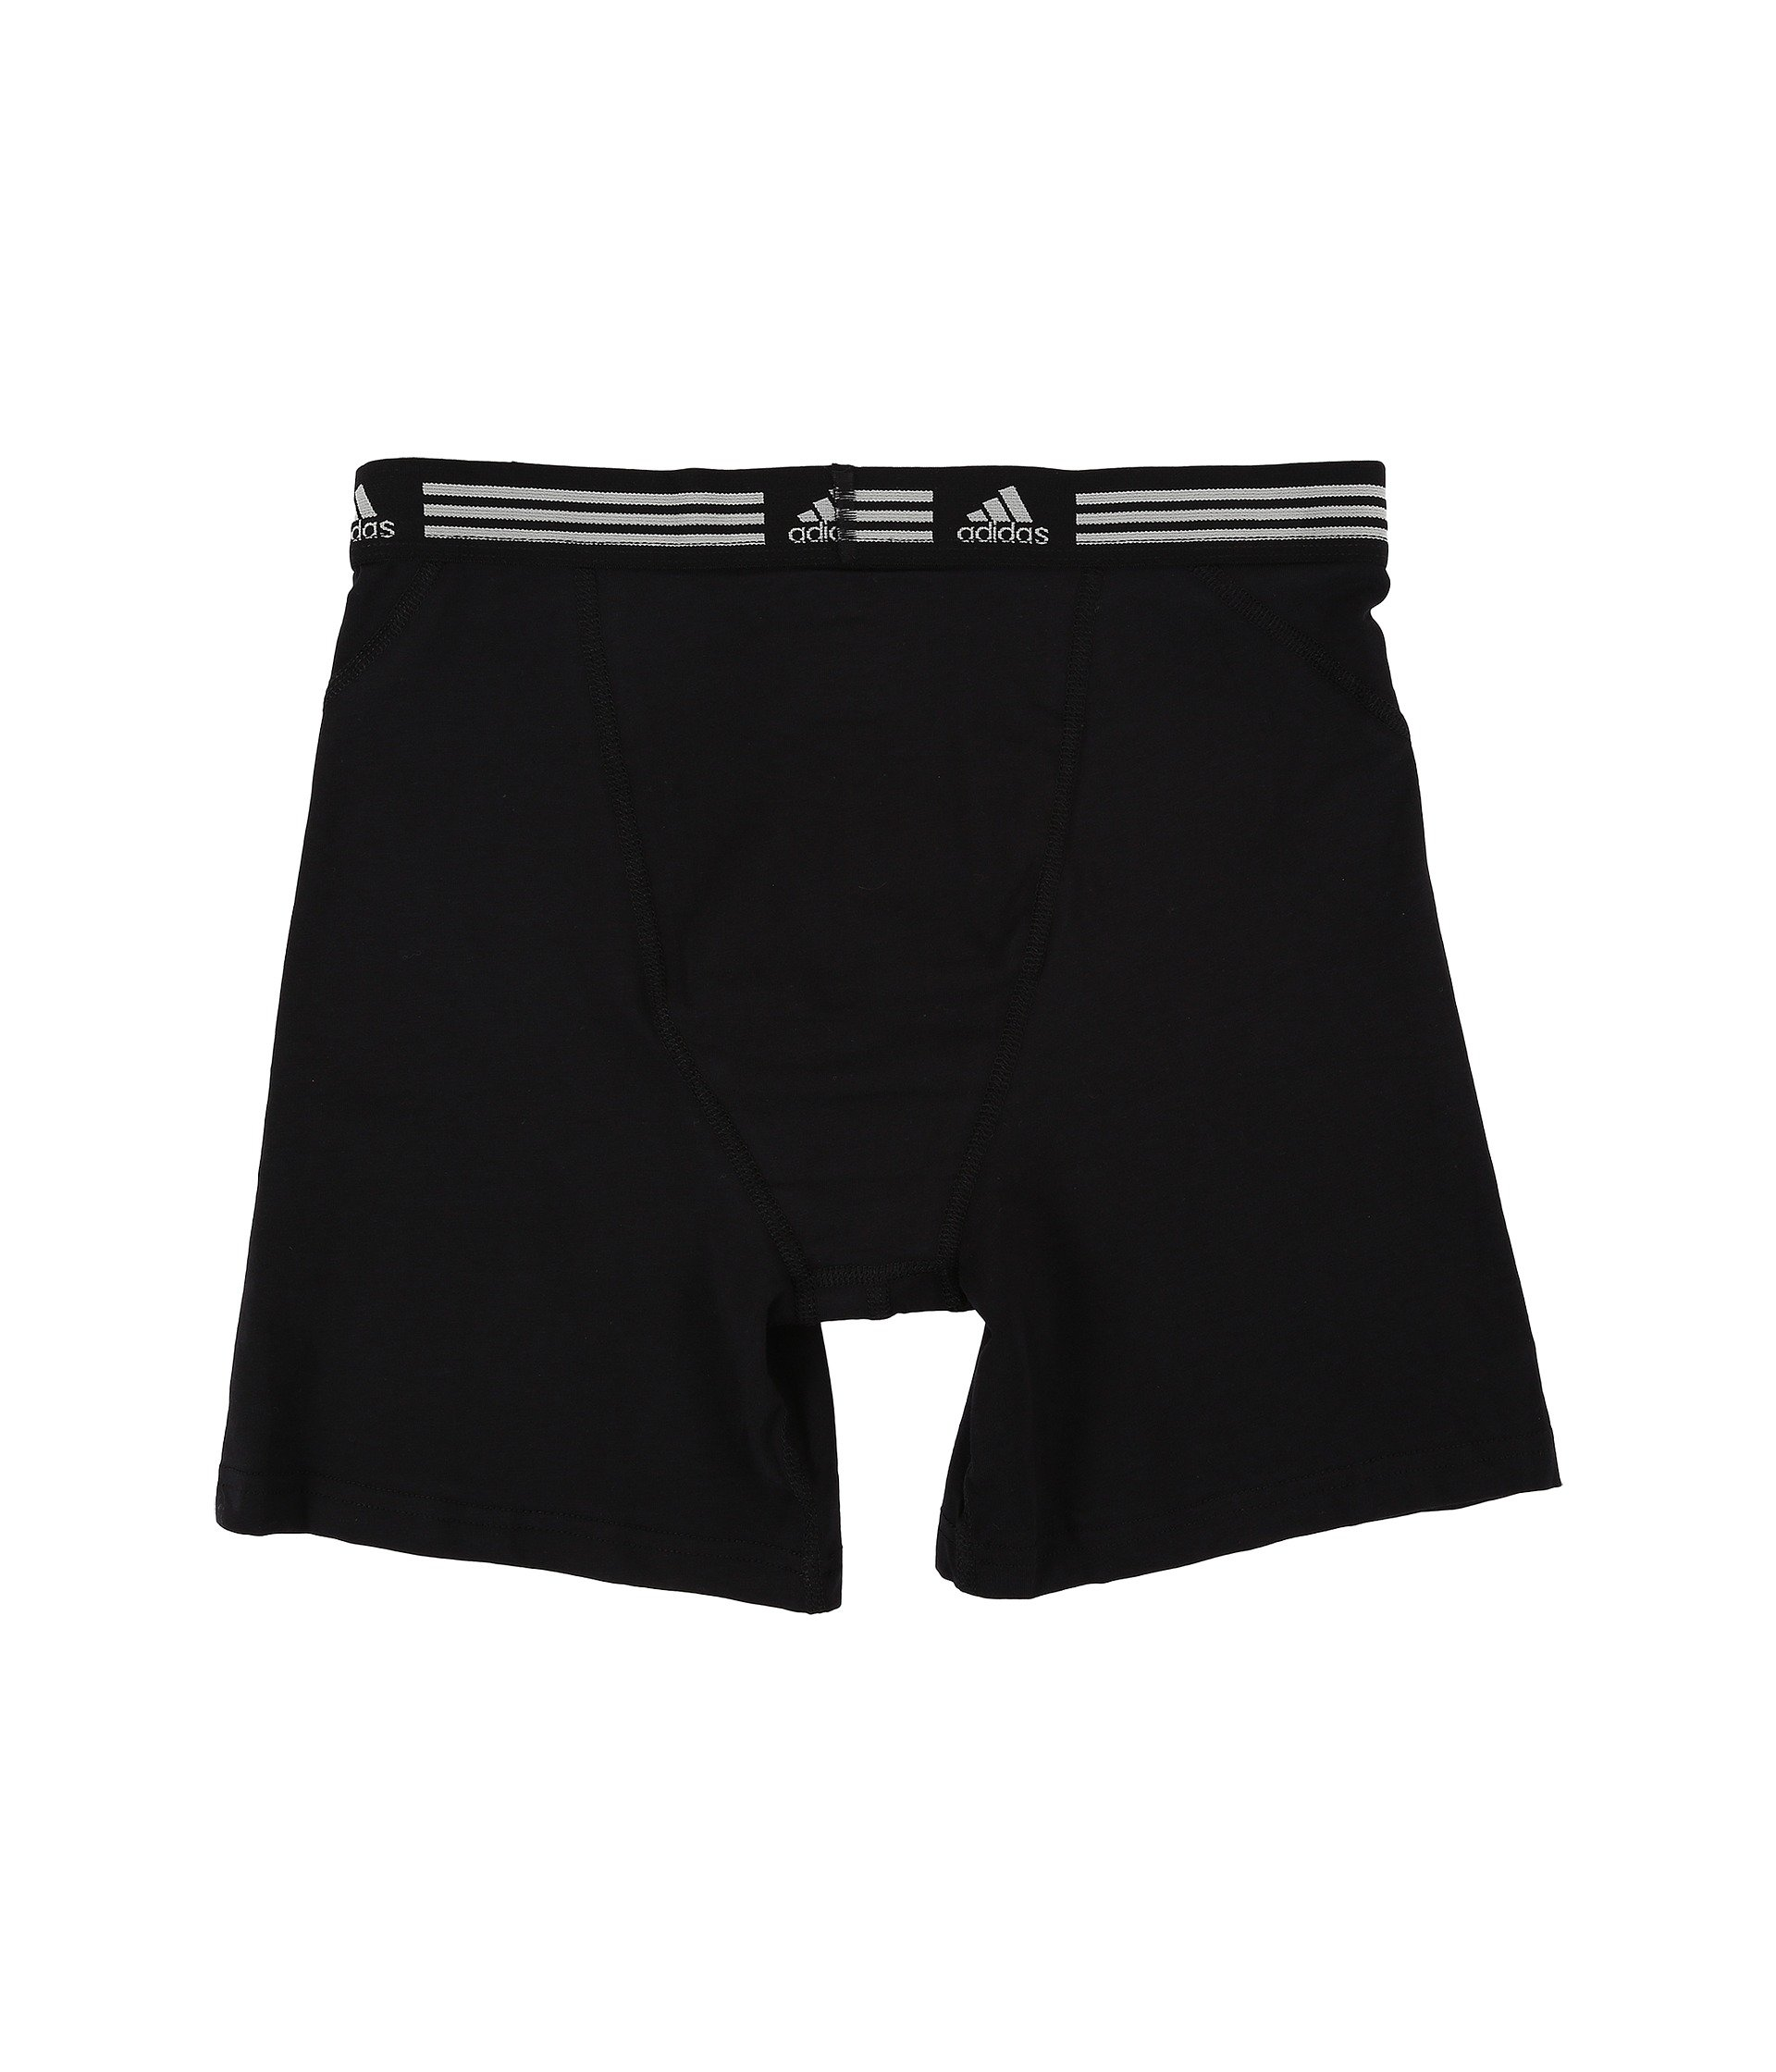 black Athletic Stretch 2 Adidas black pack Black black Boxer Brief P0qF1dx